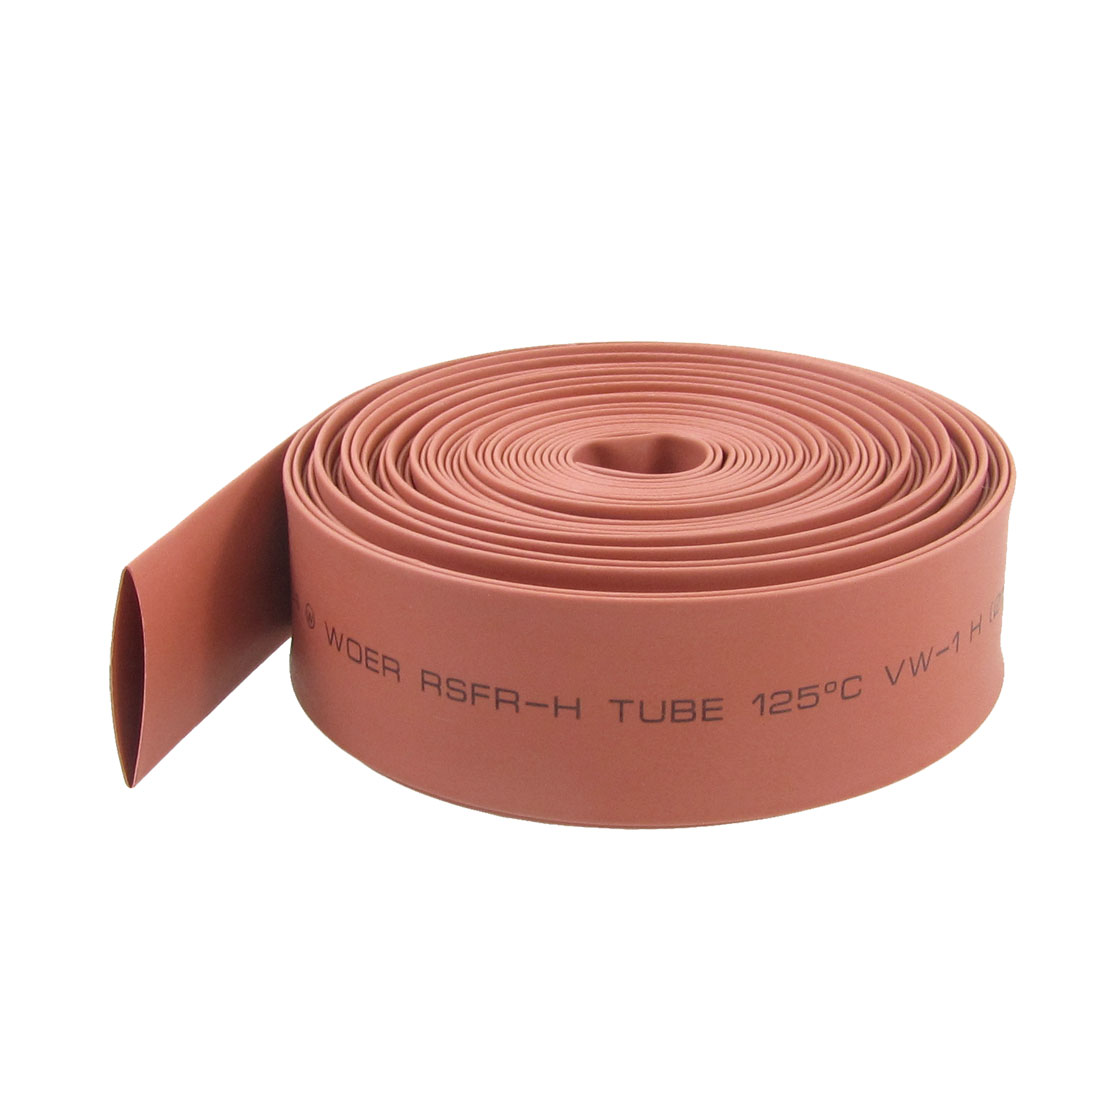 Ratio 2:1 15mm Diameter Red Heat Shrinkable Tube Tubing 6M